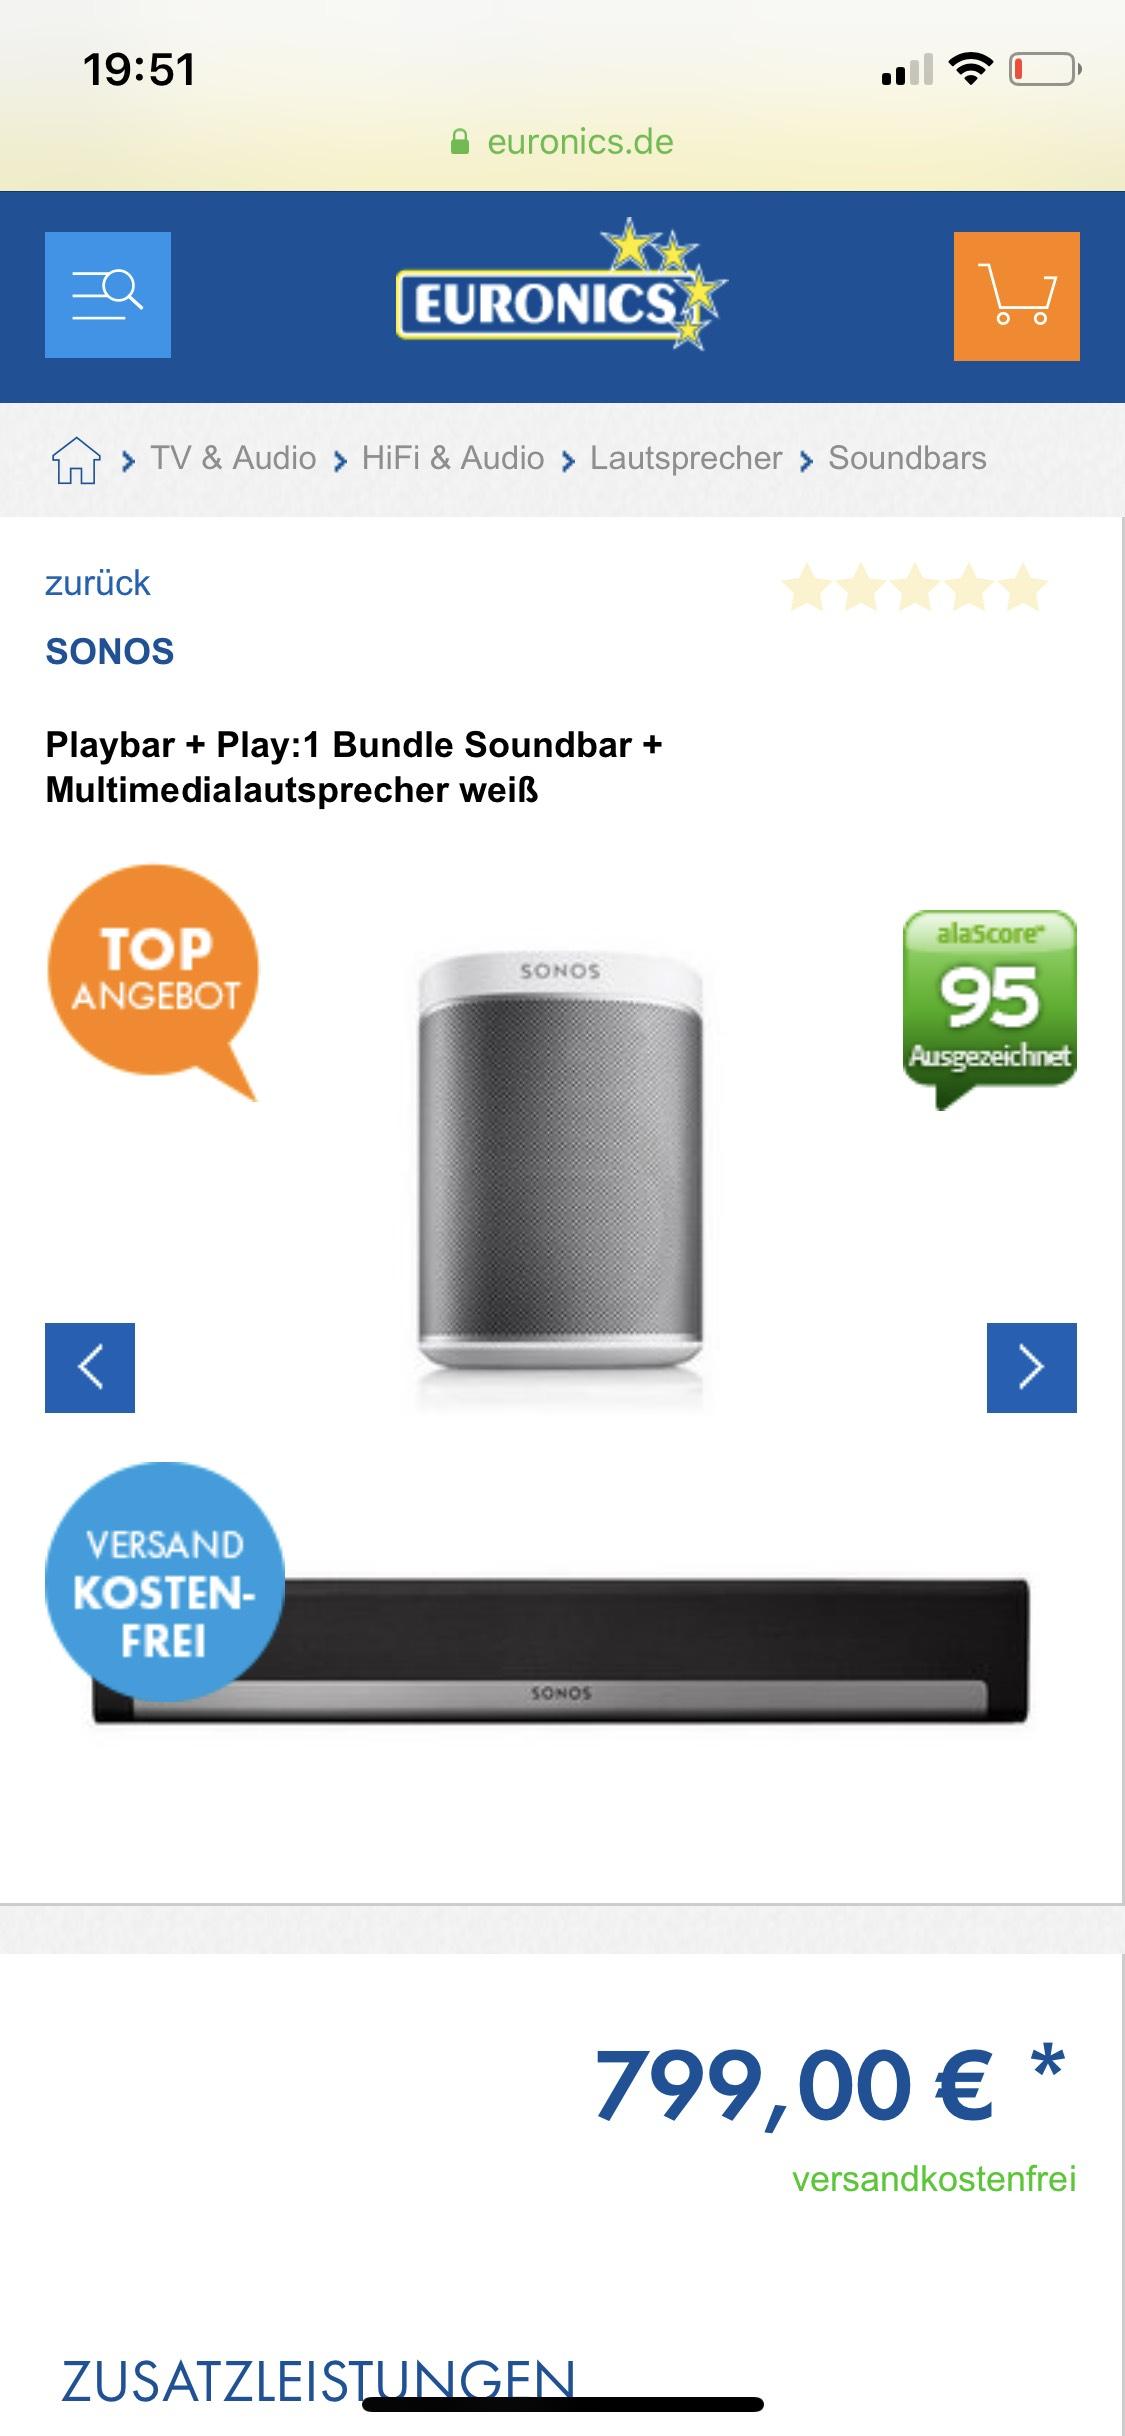 Sonos Playbar + Play: 1 Bundle